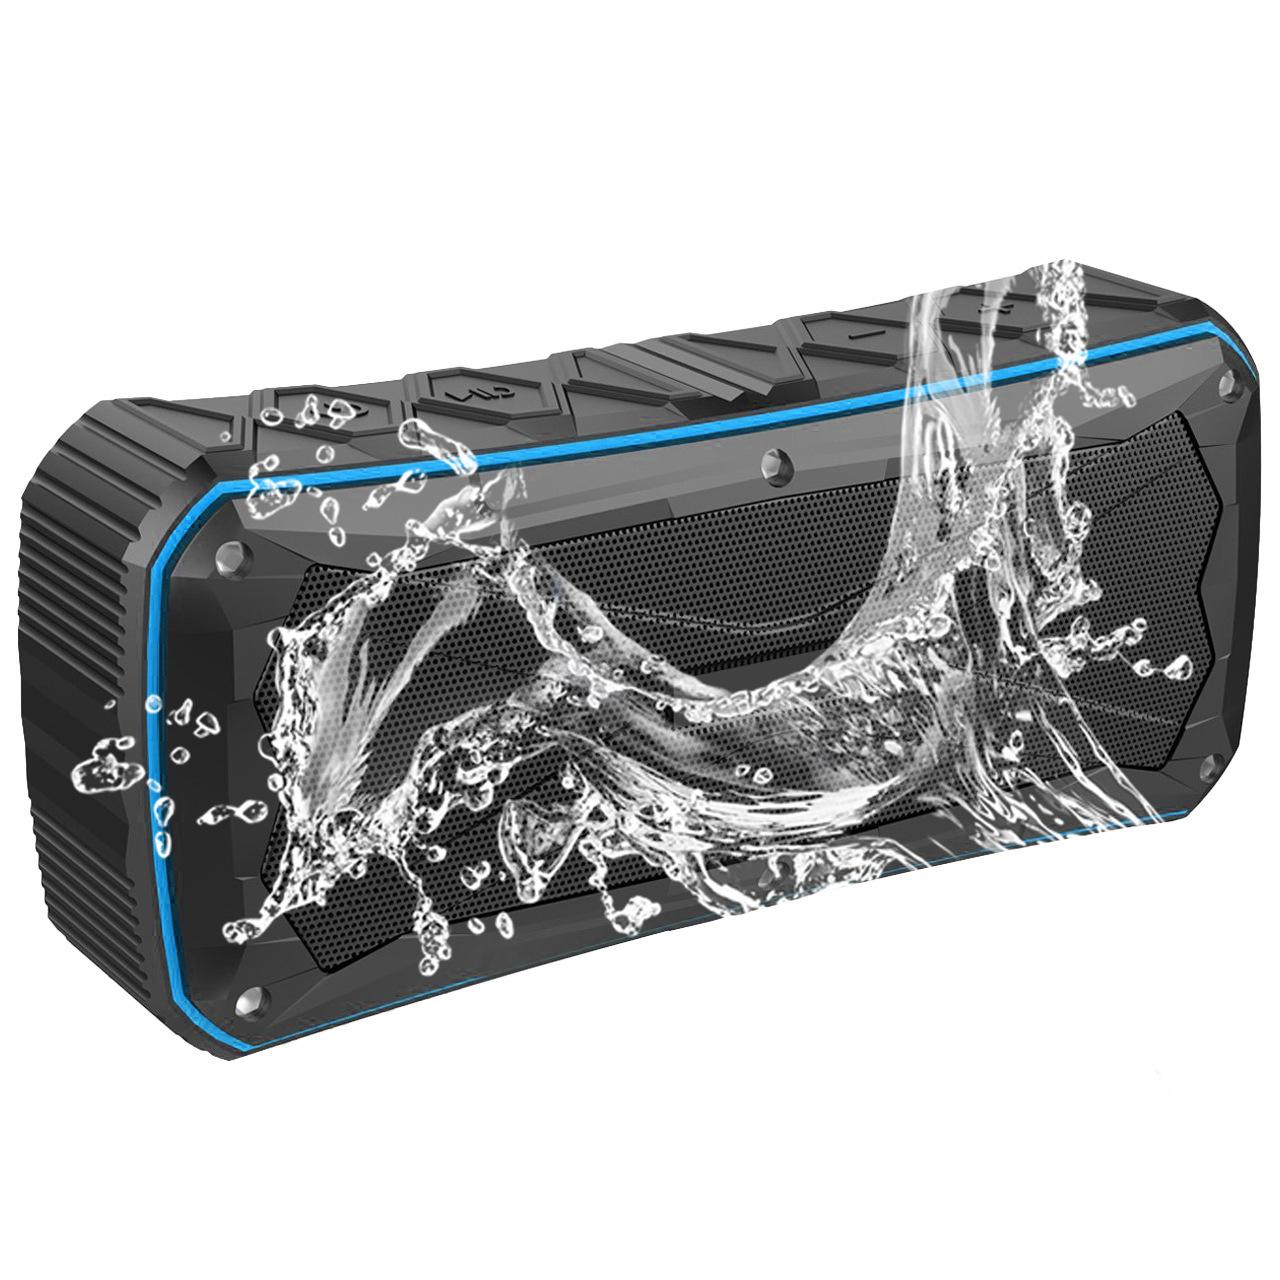 S610锂电池户外 通用带移动电源音响便携家用电器影音电器蓝牙音